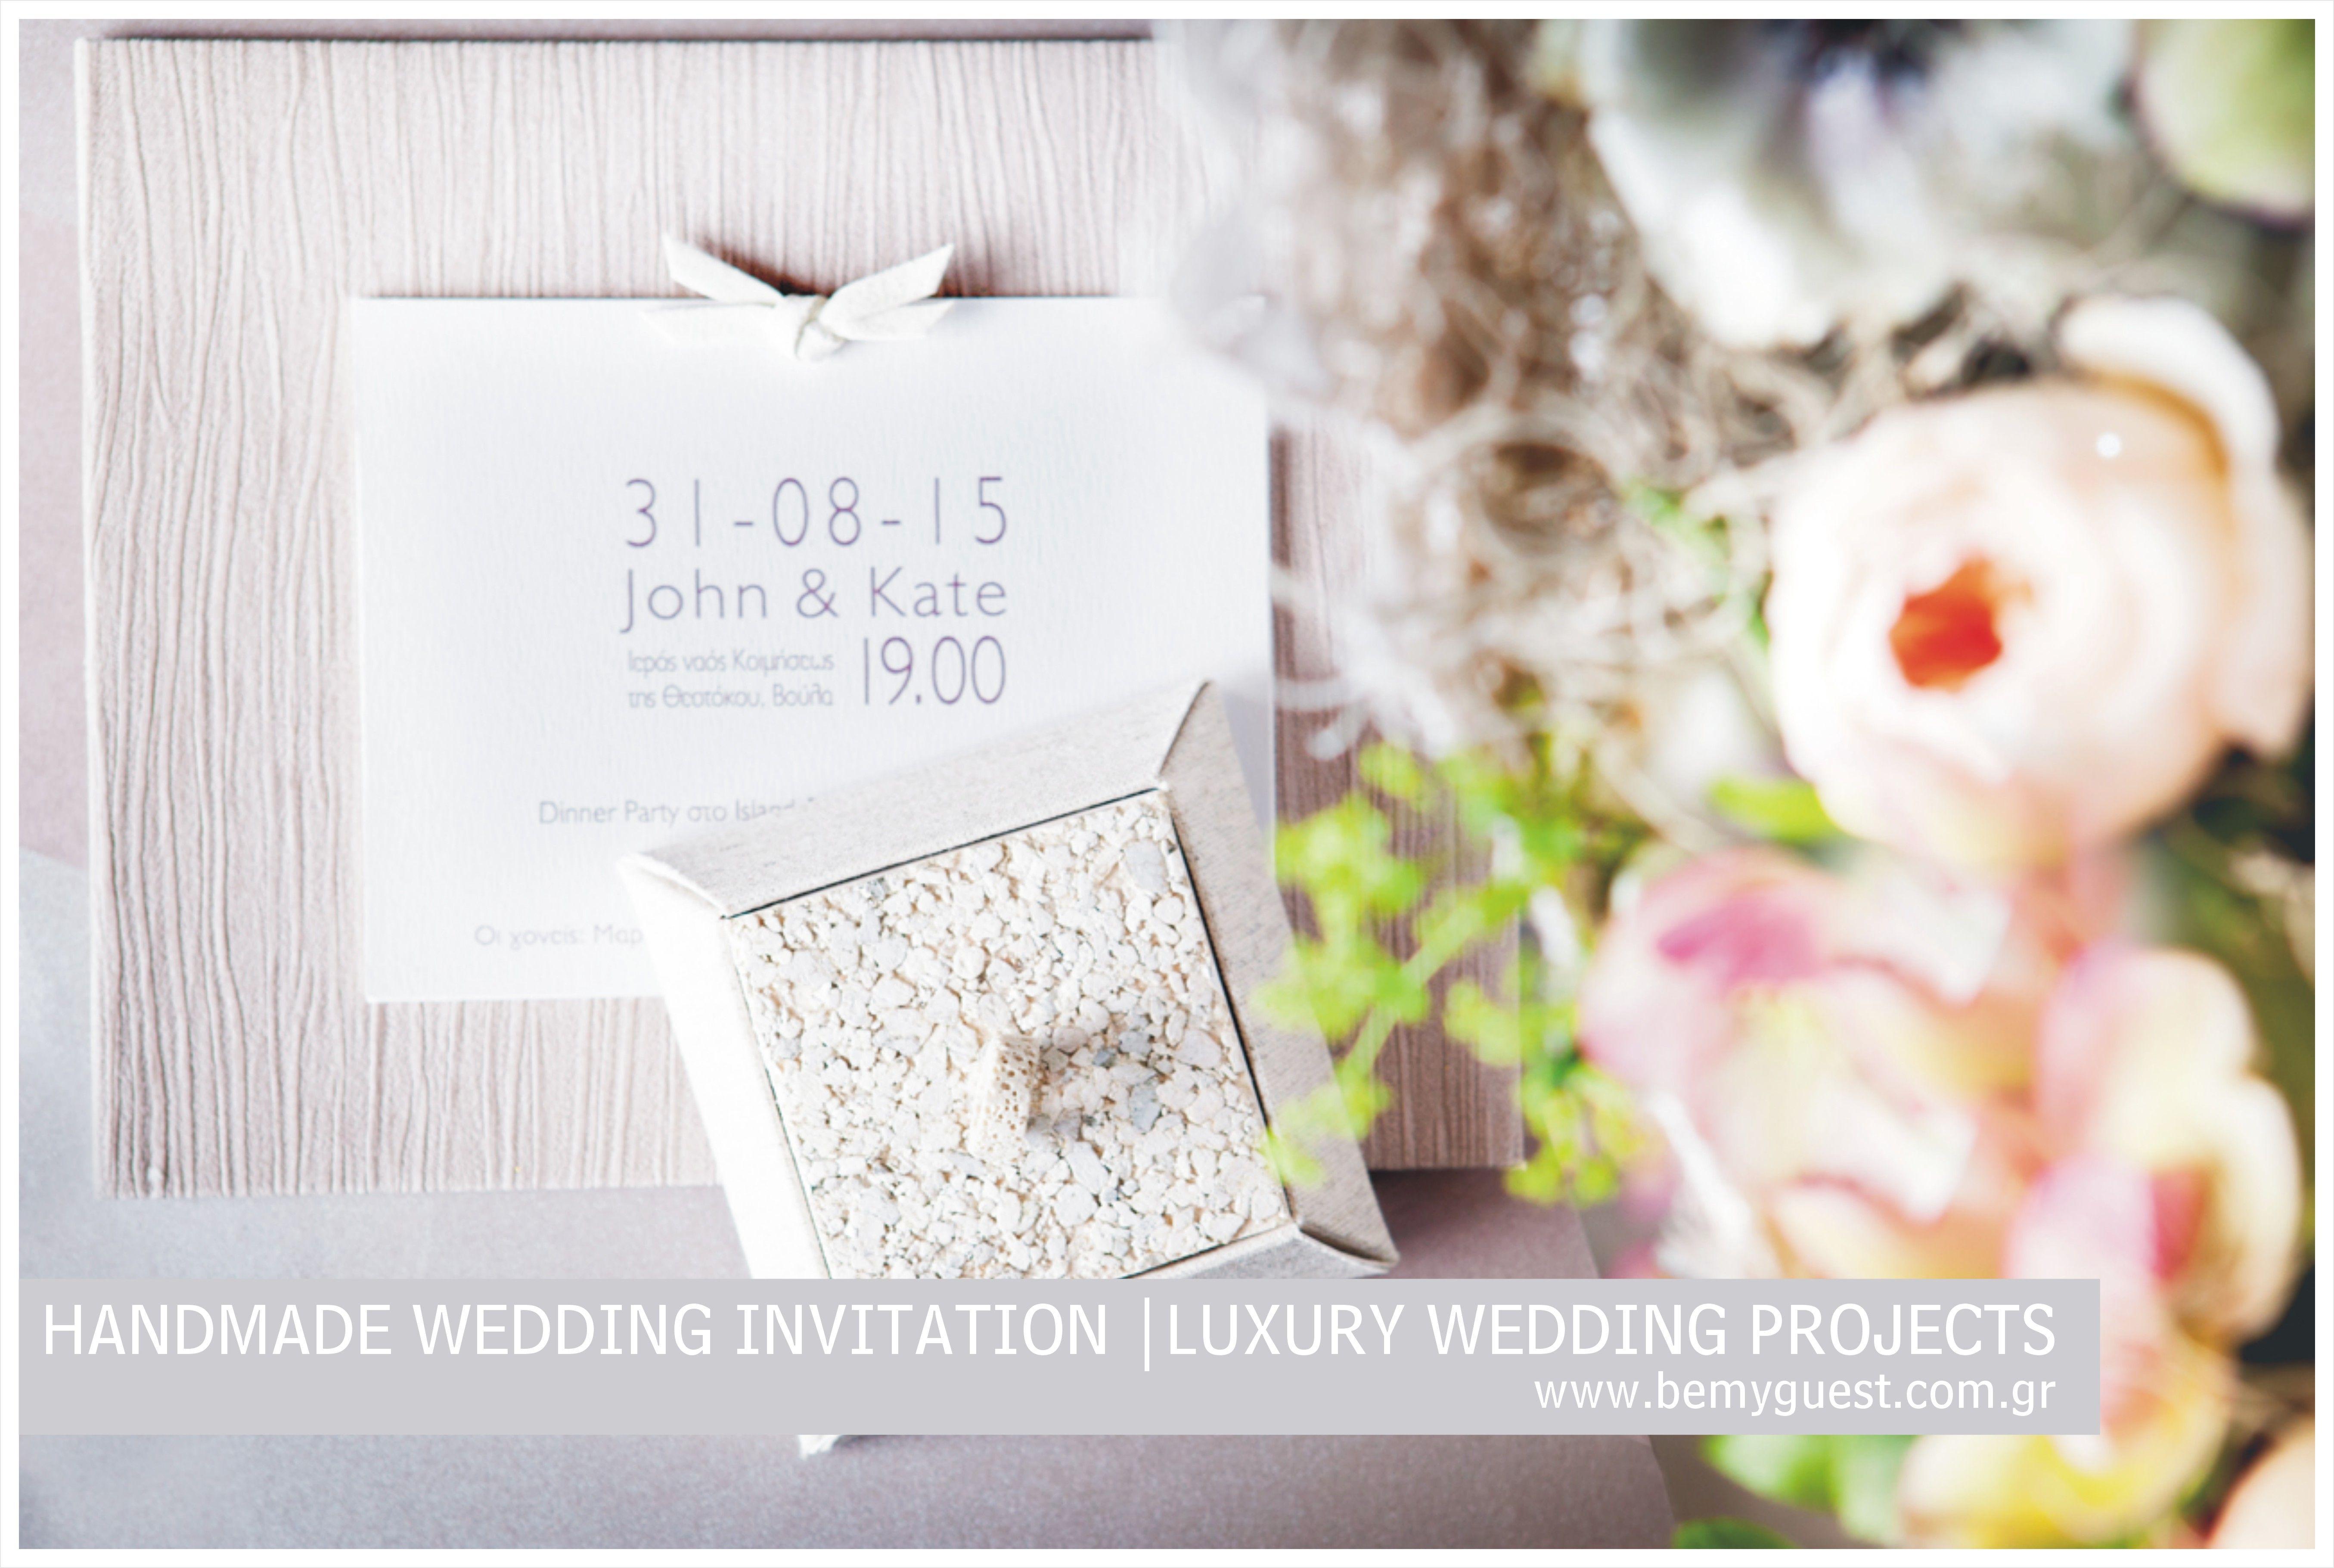 handmade wedding invitation | grey & pink | unique favors box ...